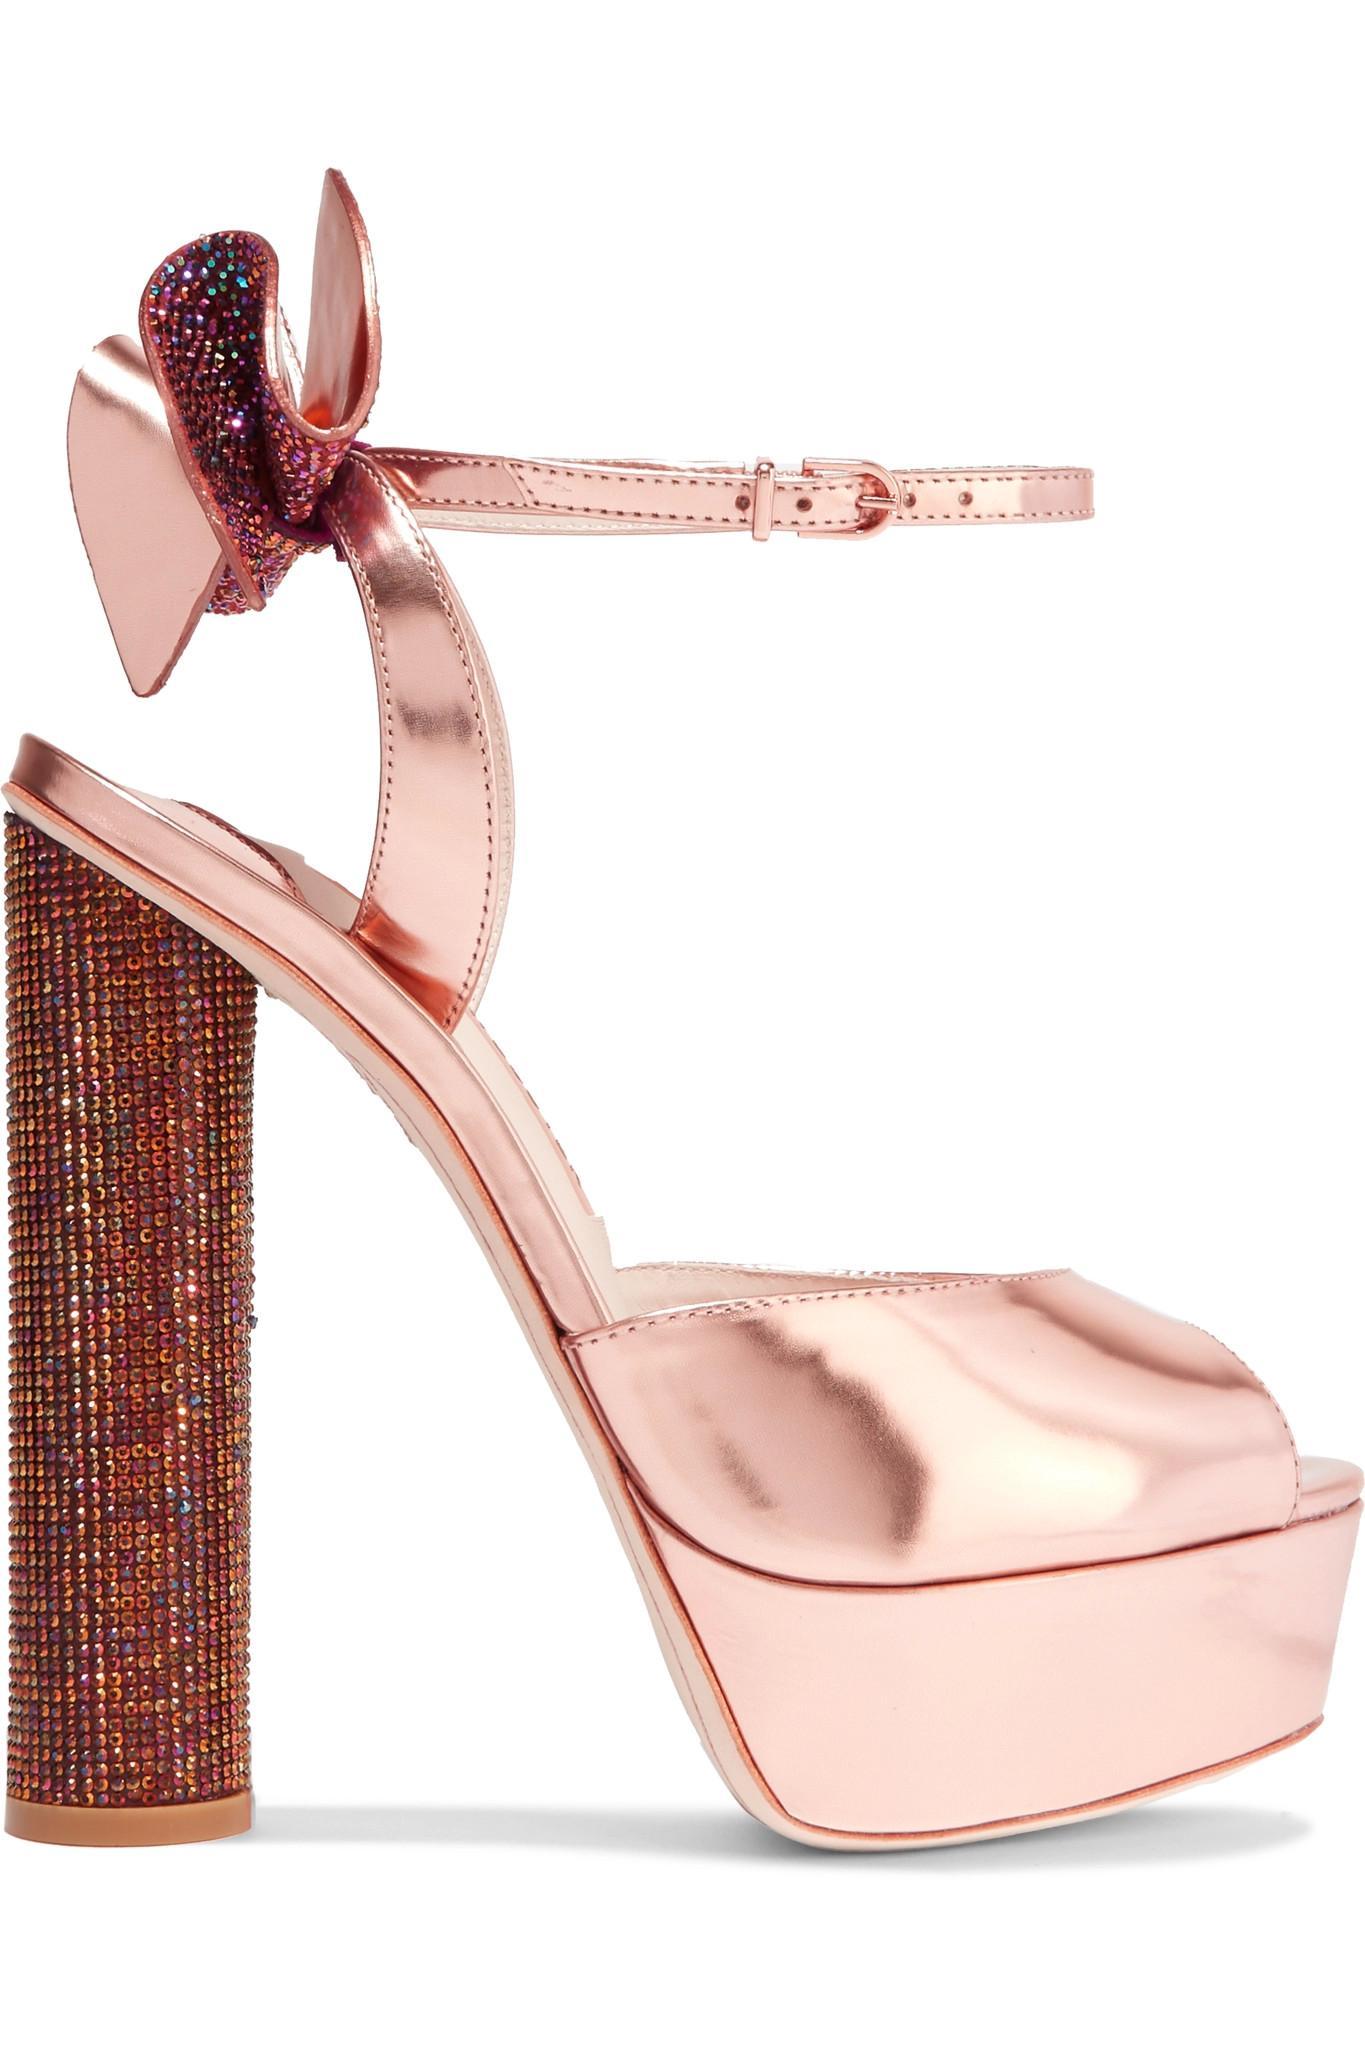 257f3c8afa5 Lyst - Sophia Webster Raye Bow-embellished Metallic Leather Platform ...